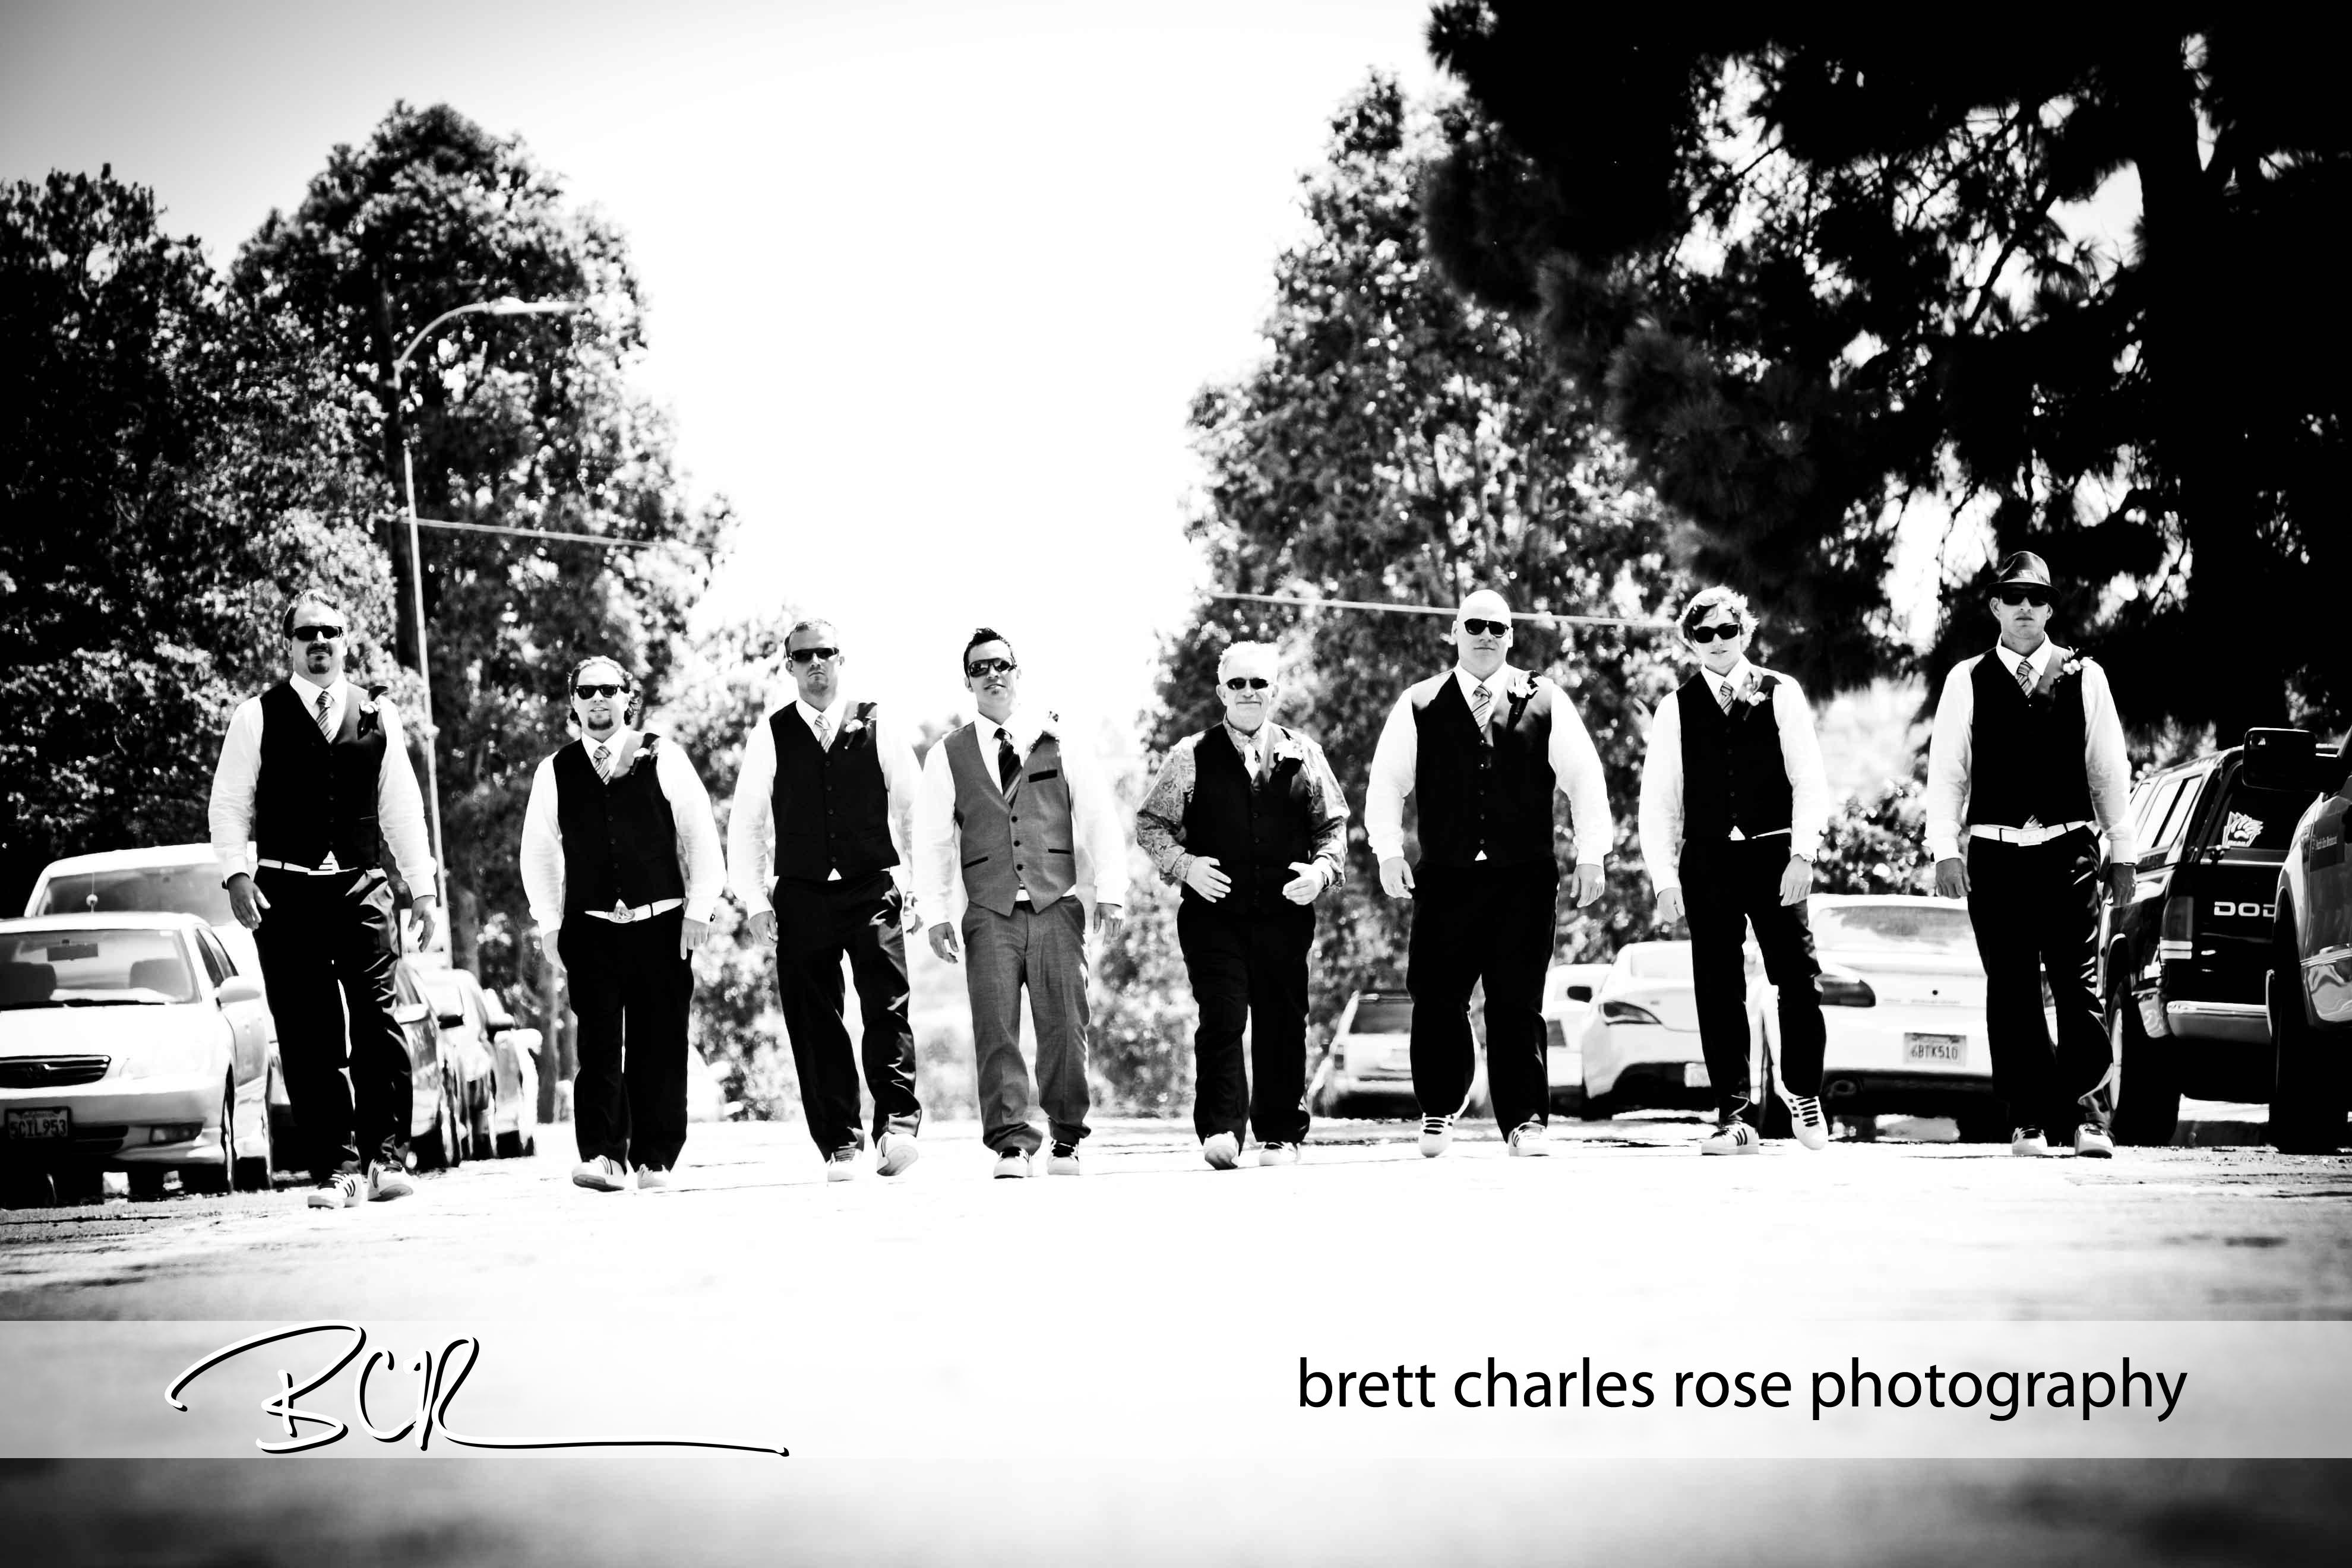 Balboa park, grooms party